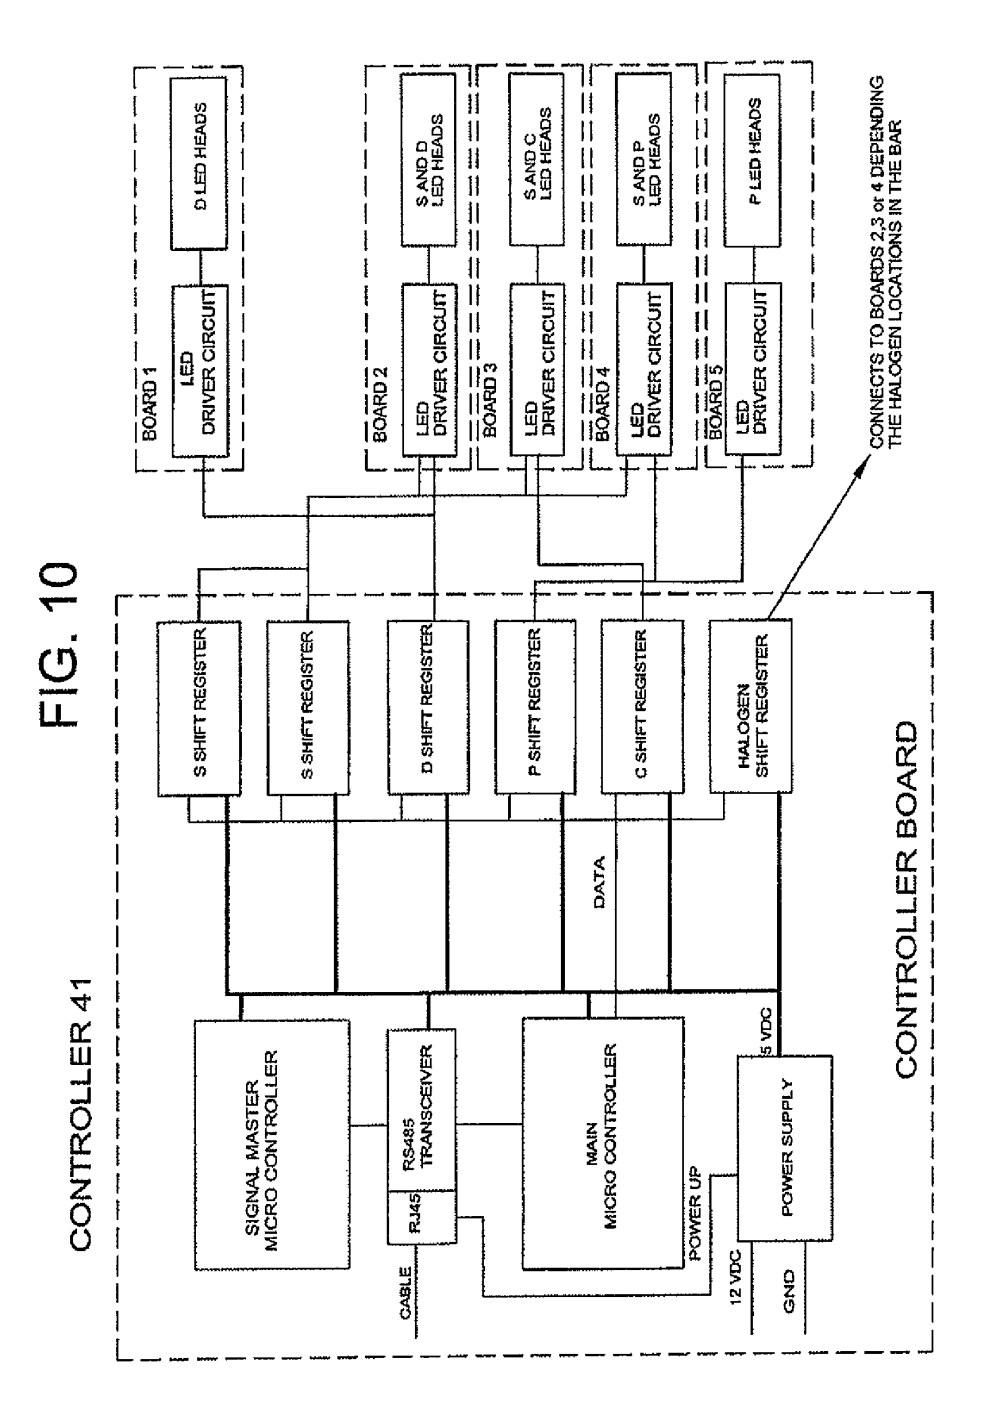 medium resolution of federal signal light bar wiring diagram wiring diagram expertsfederal signal light bar wiring diagram wiring diagram